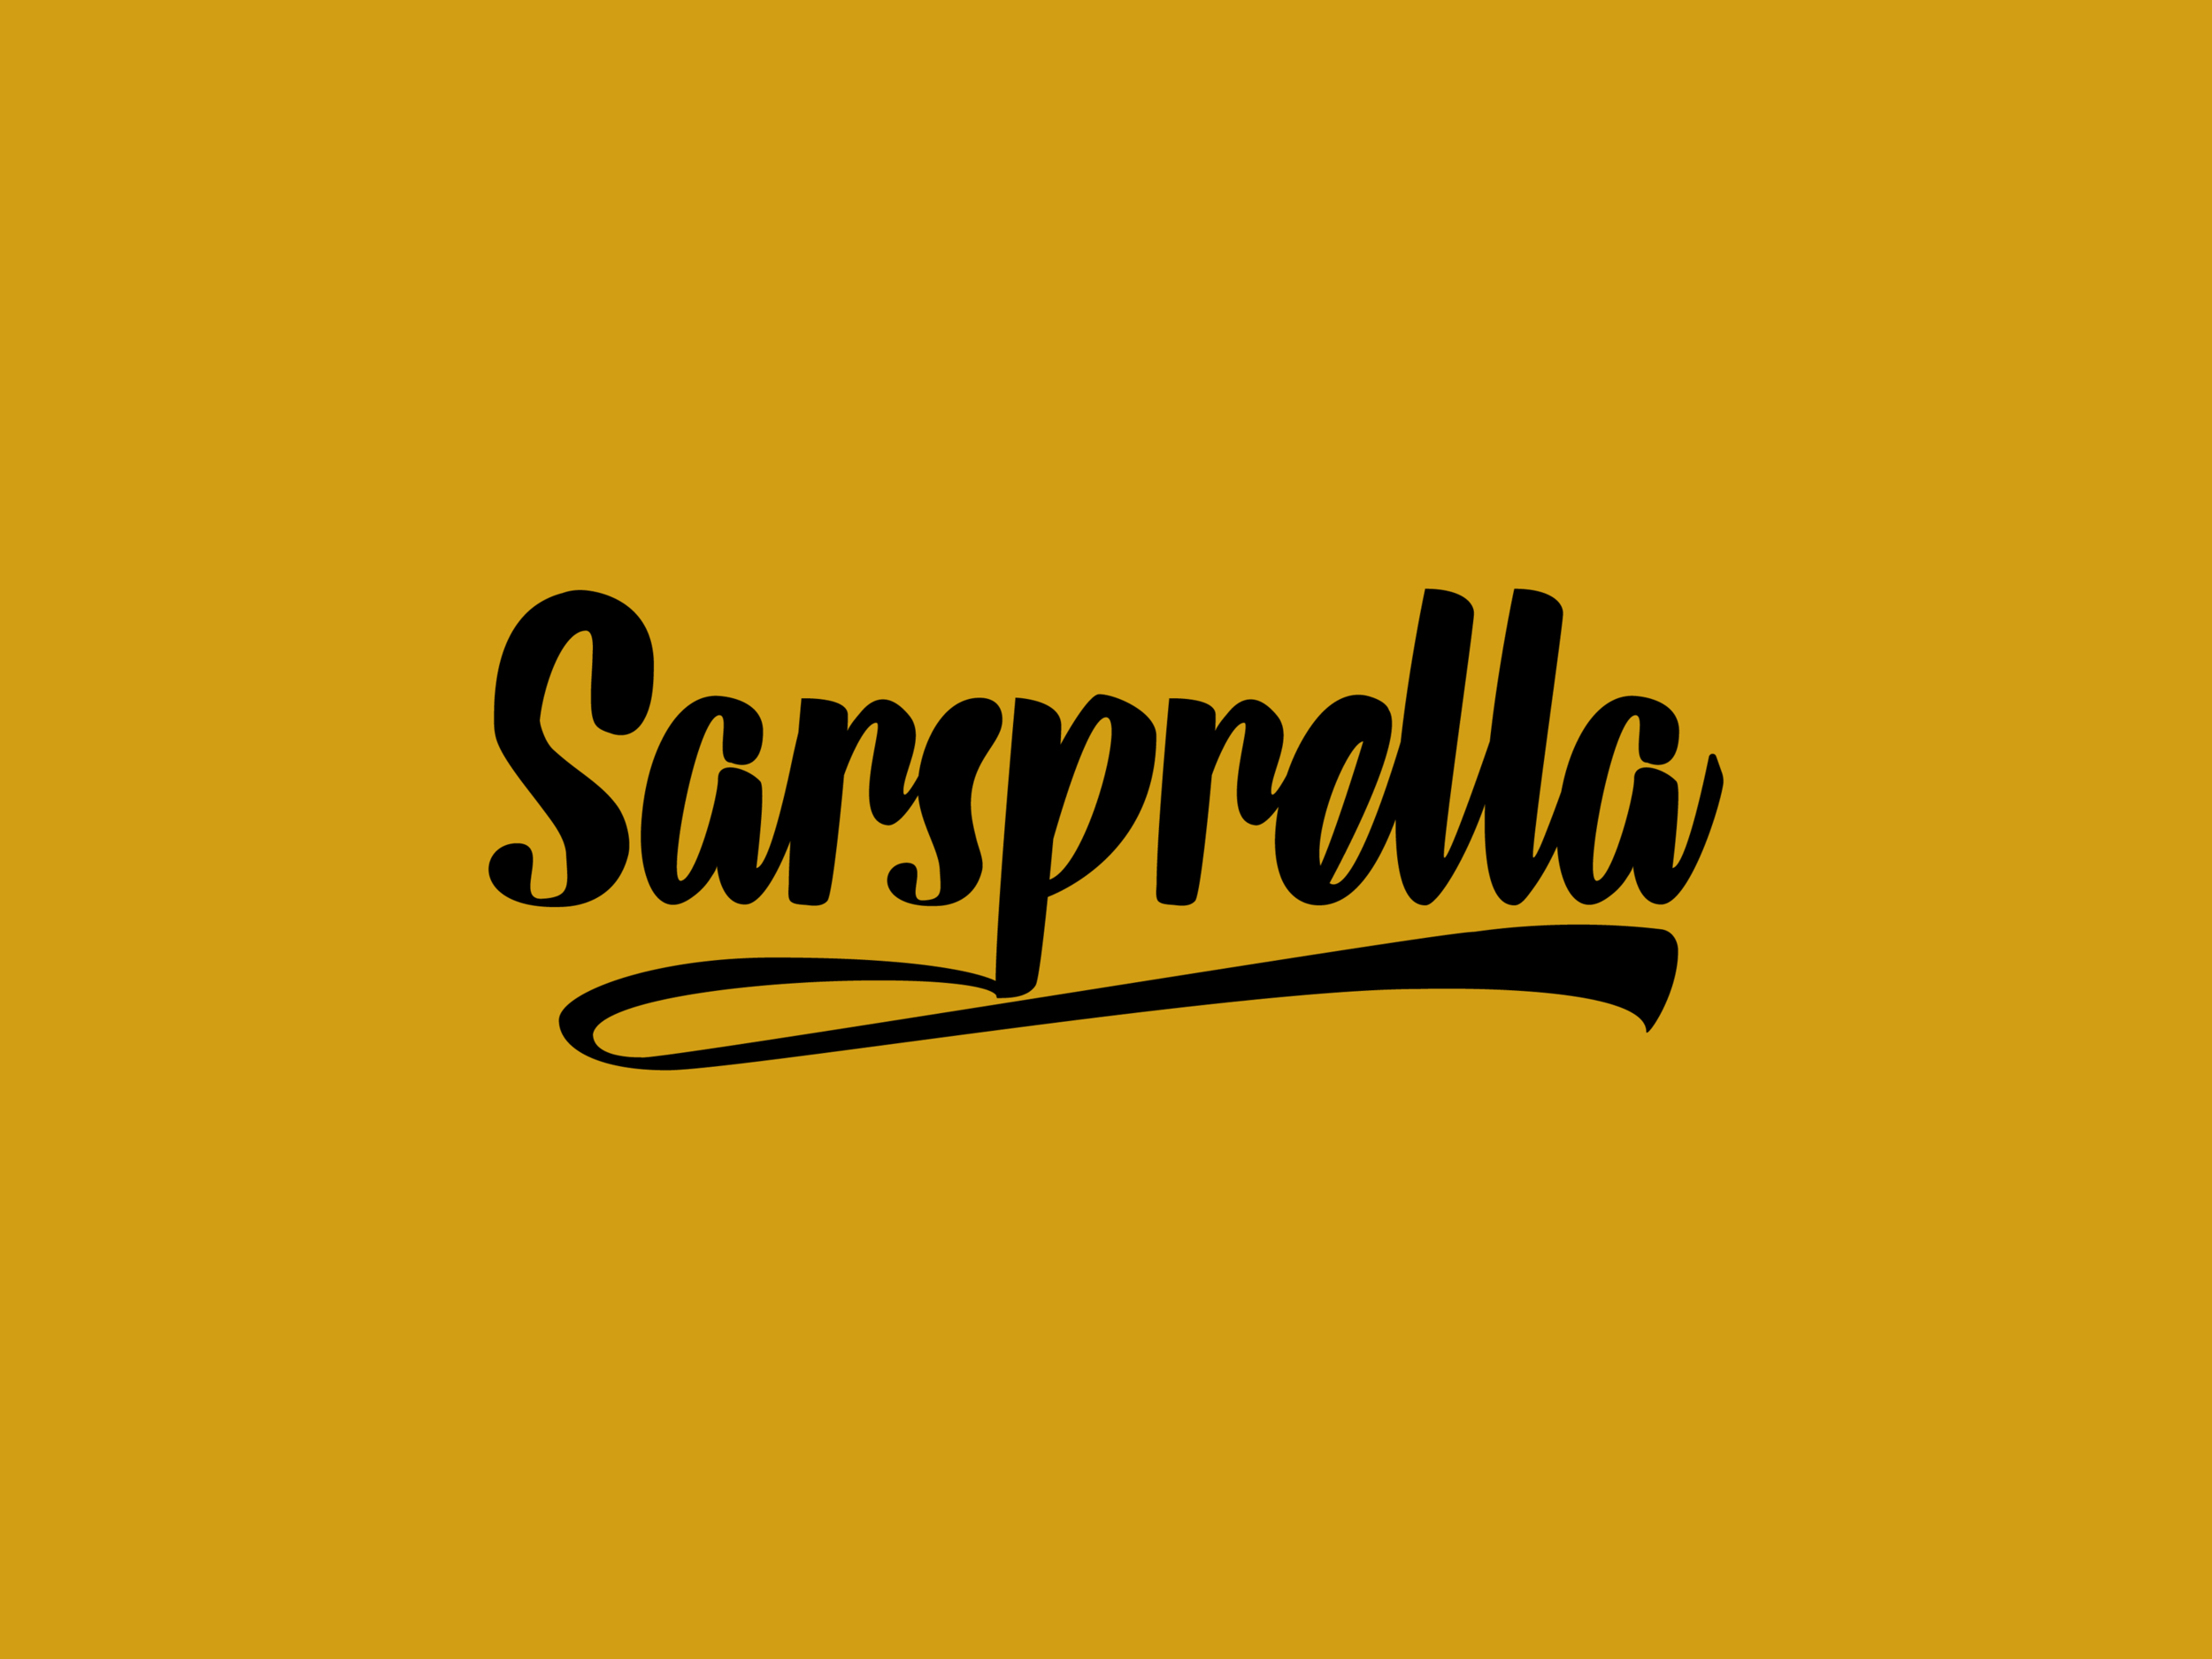 sarsprella.png